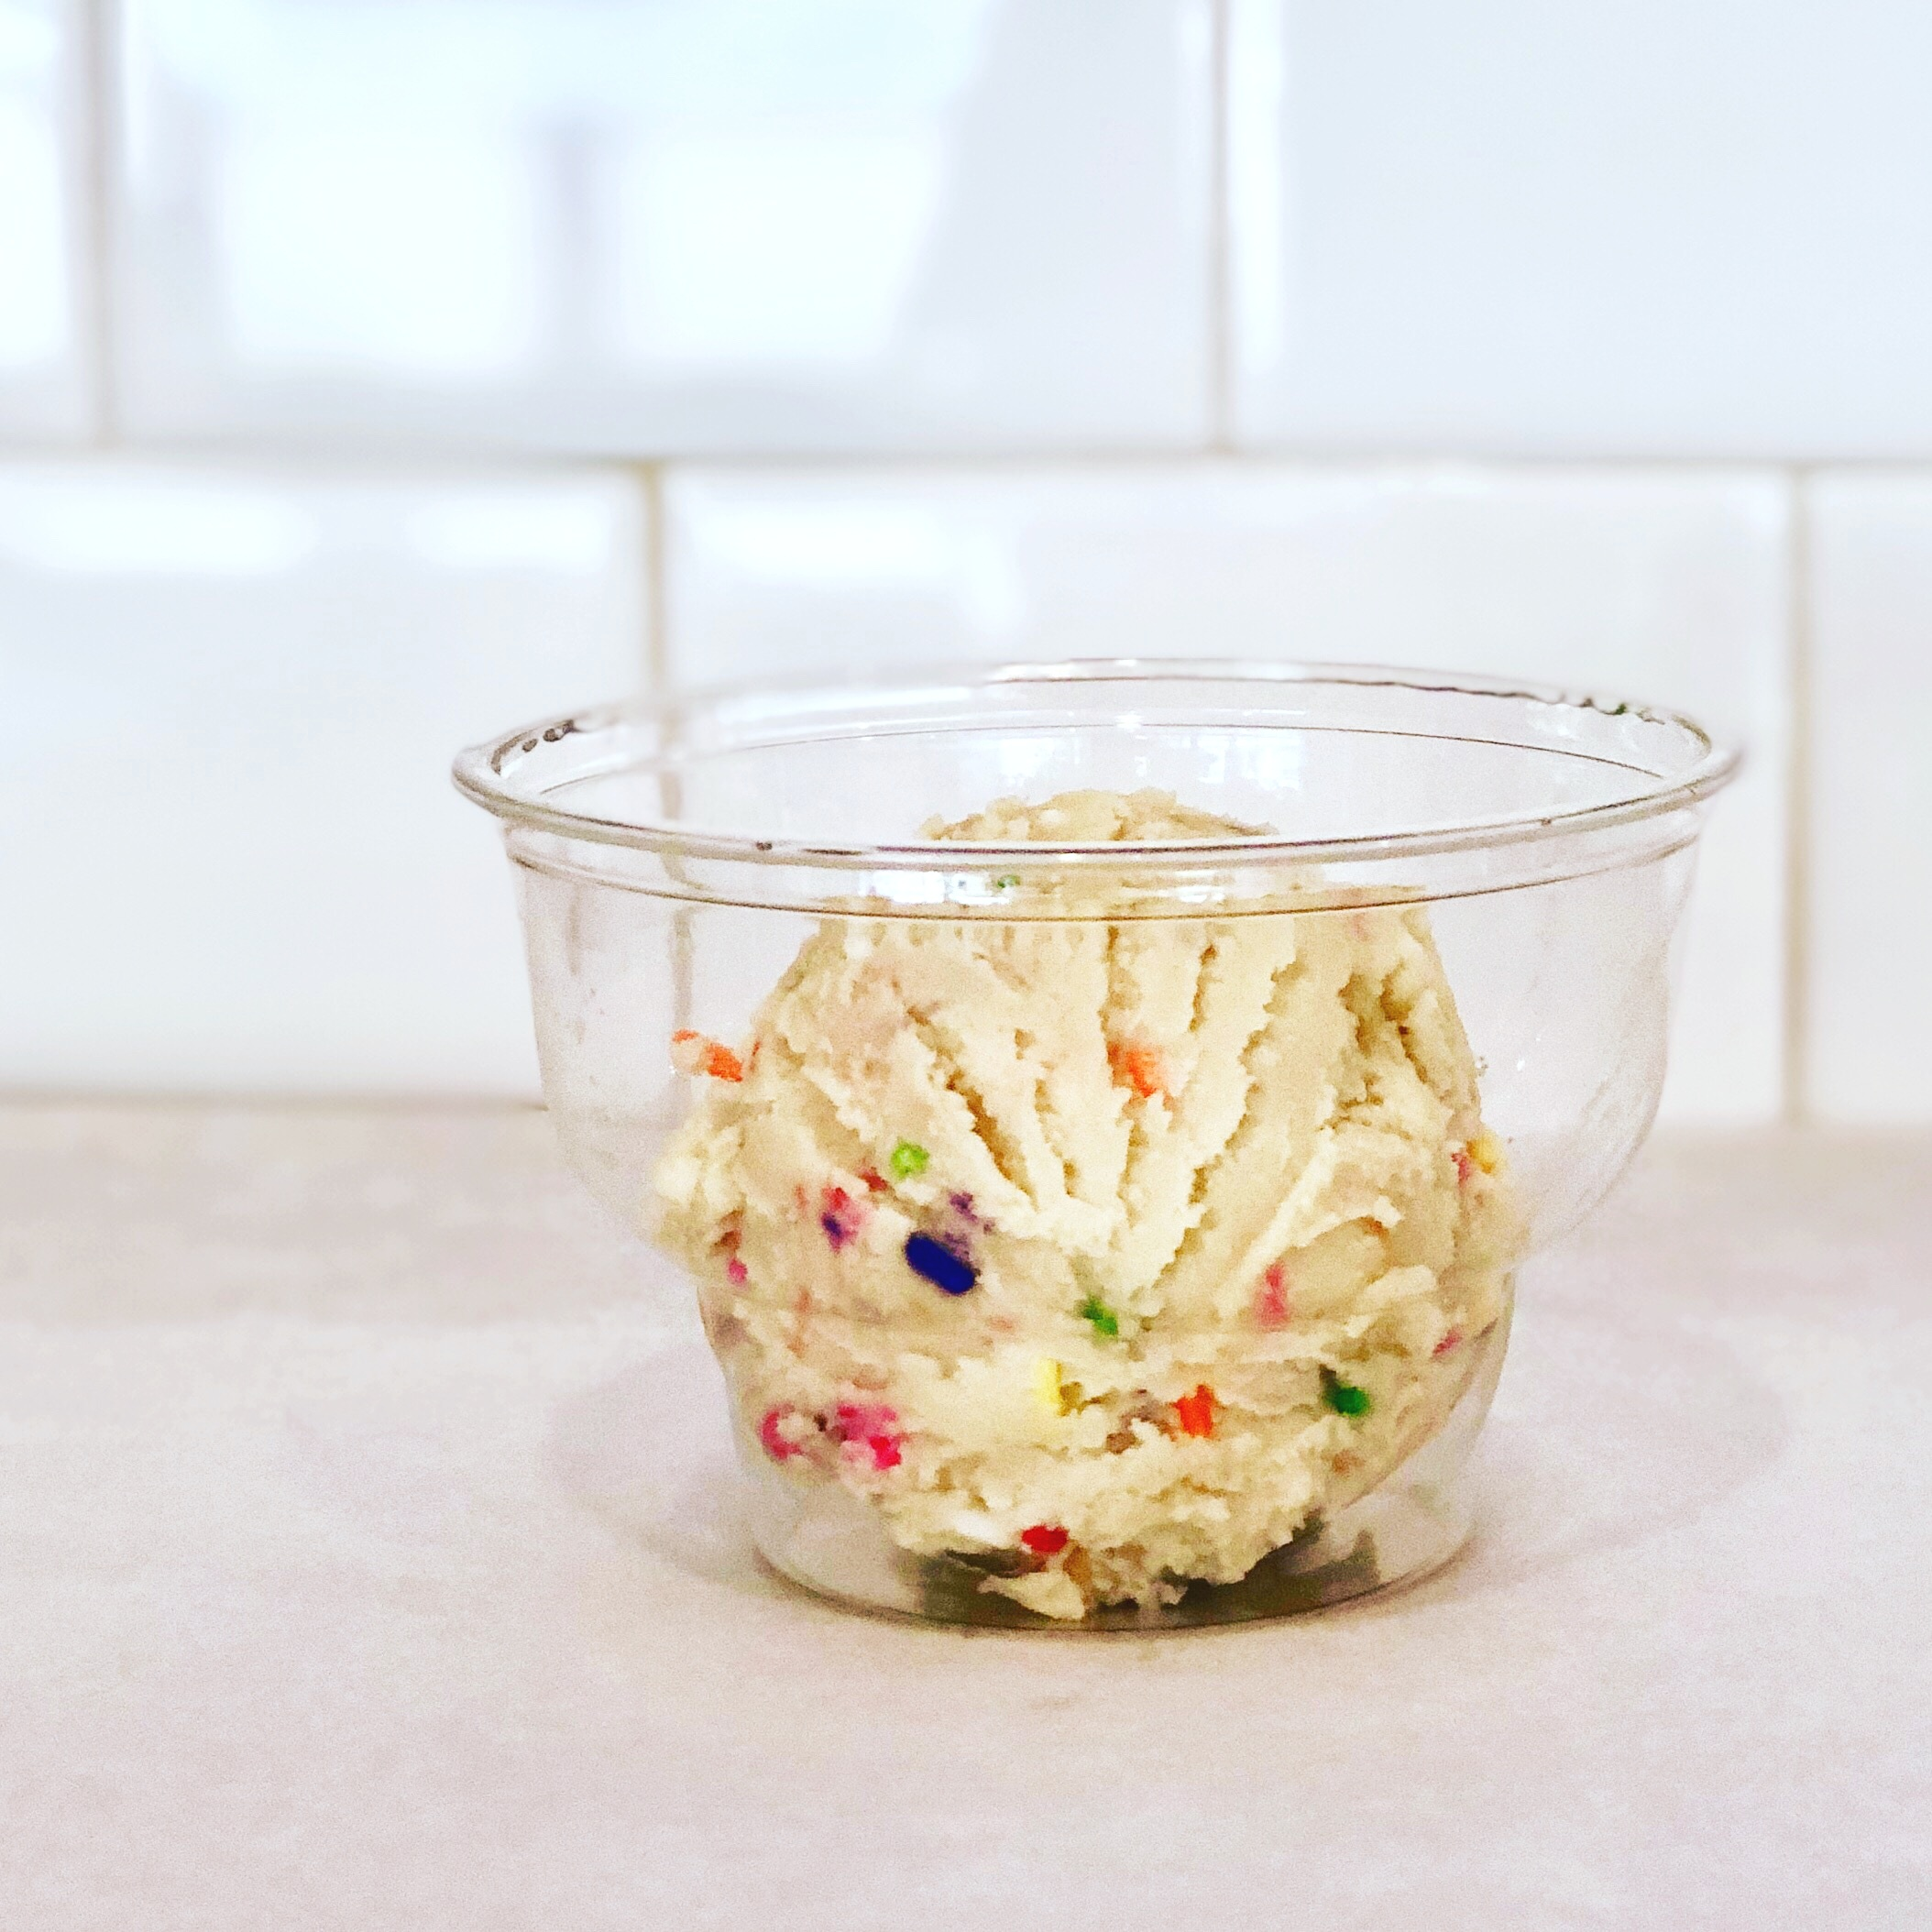 Single Scoop of our Edible Sugar Cookie Dough